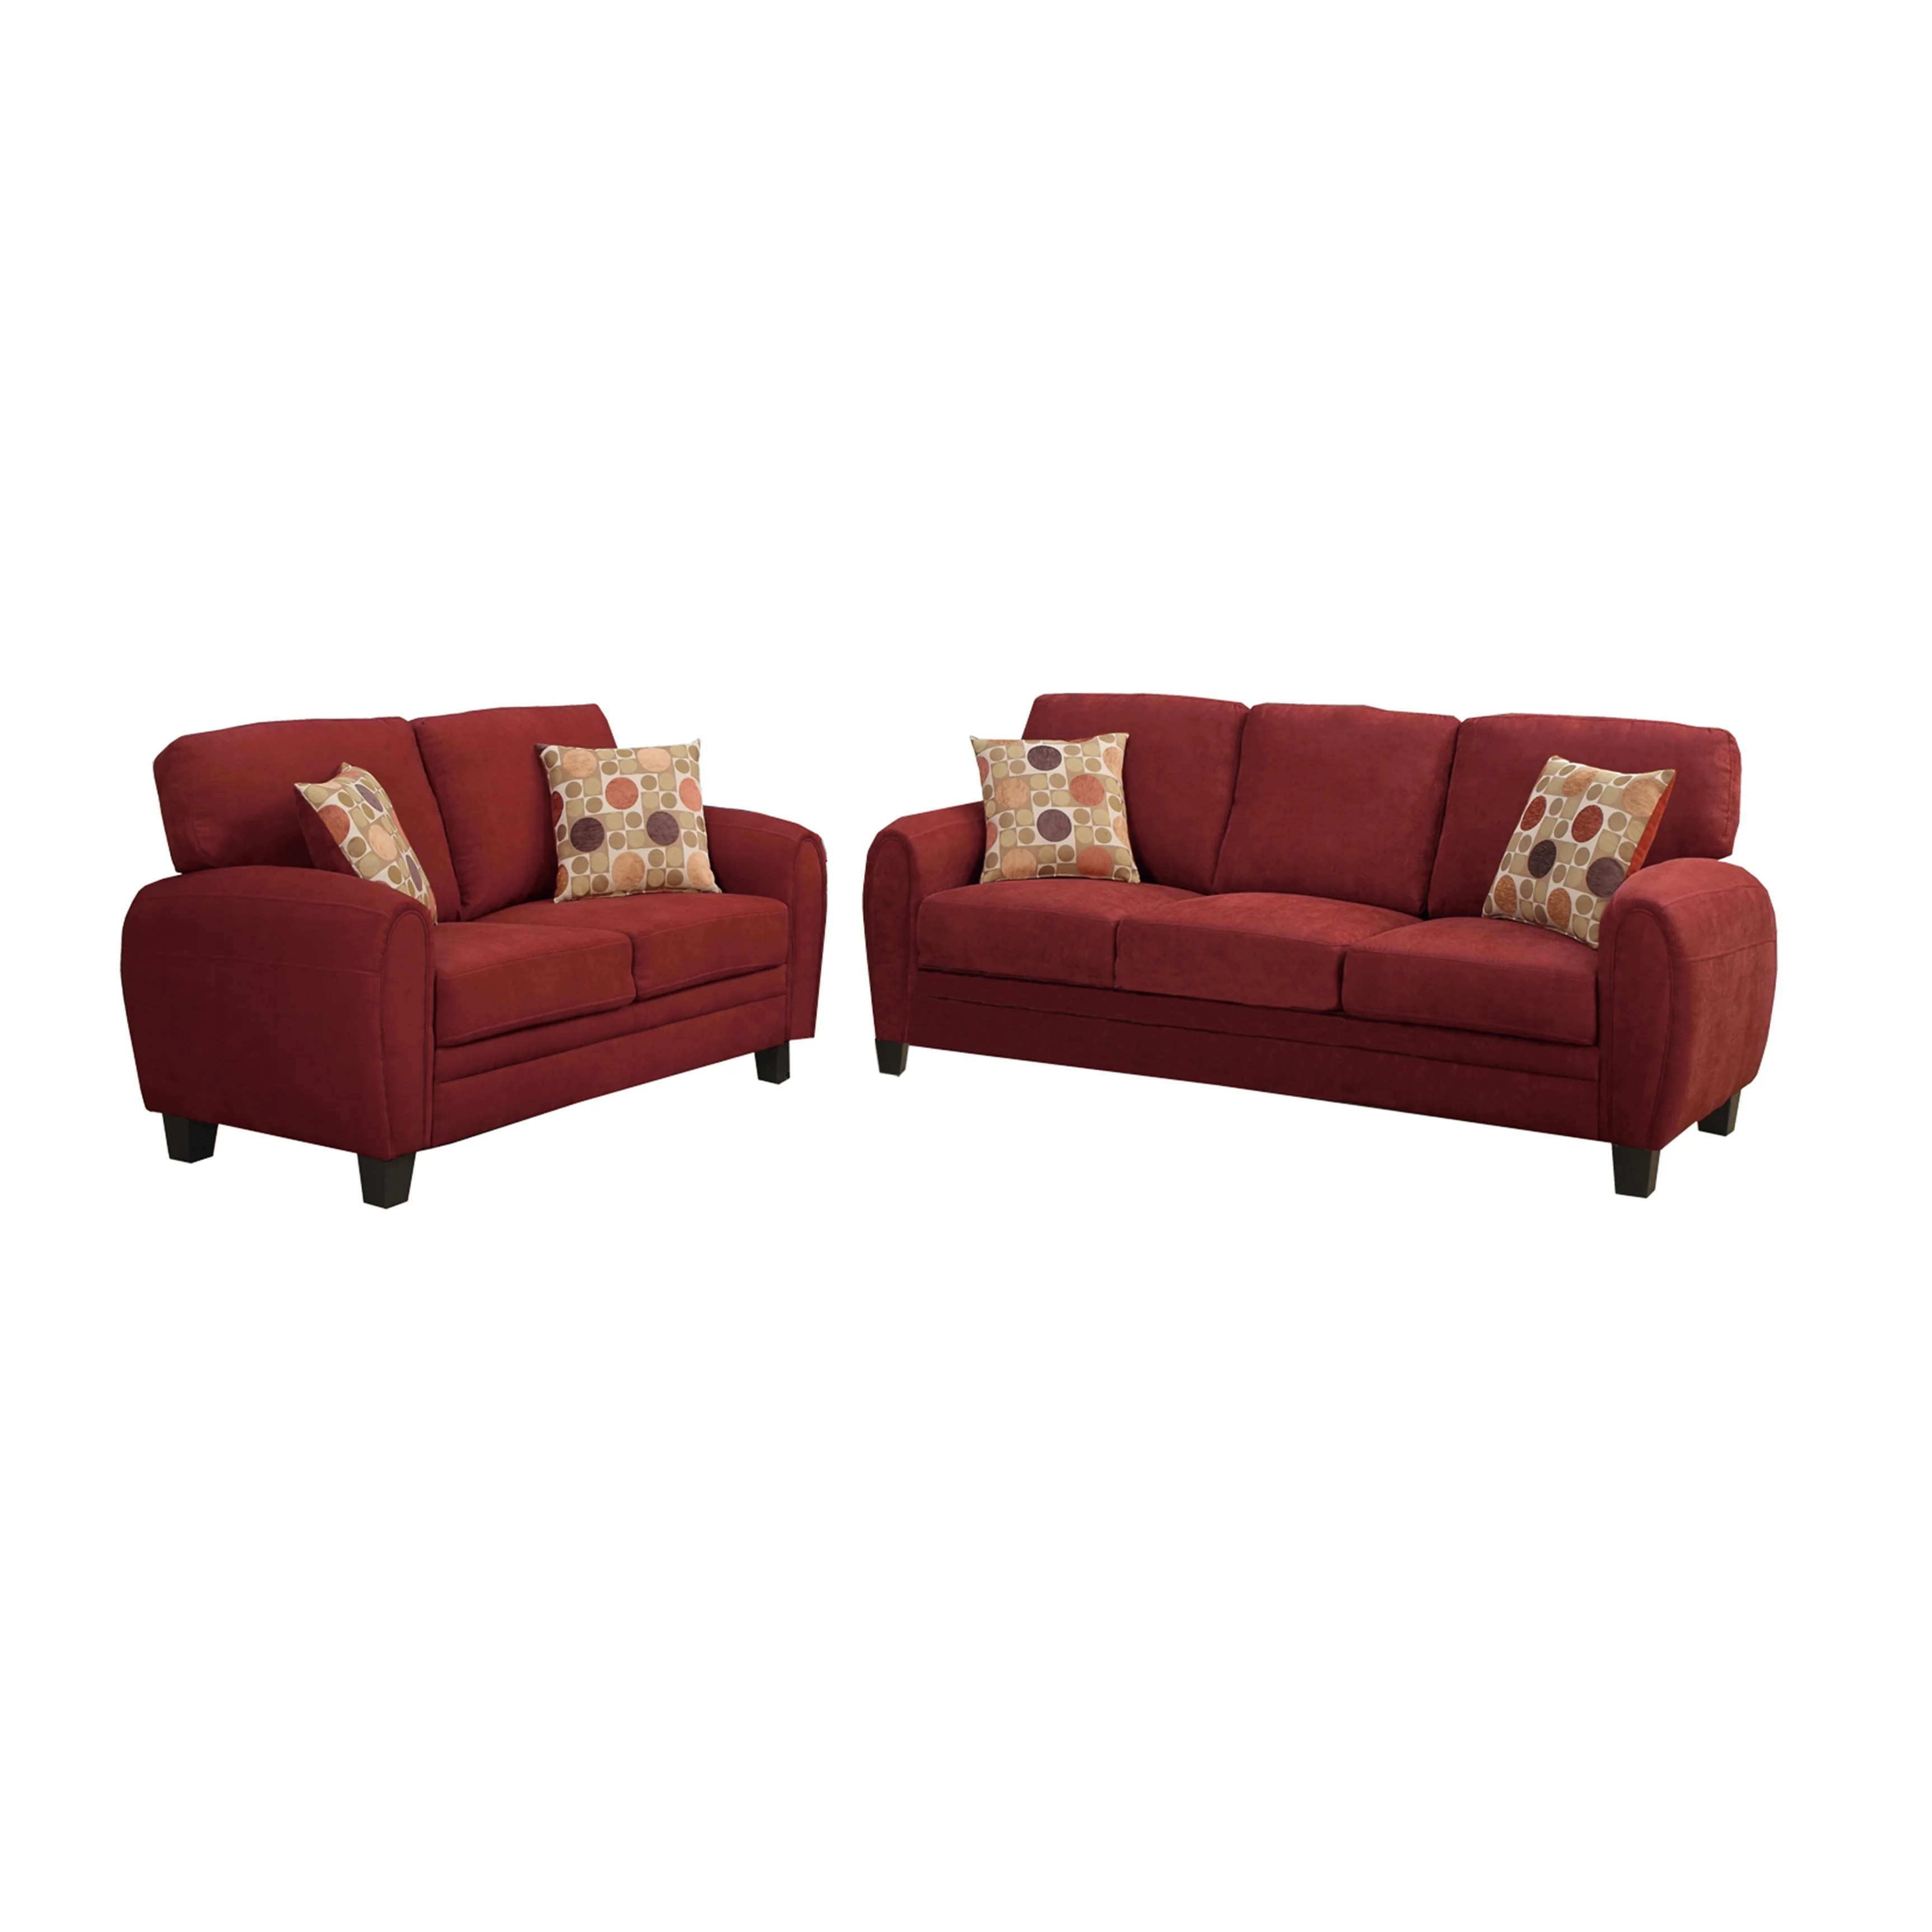 poundex bobkona arcadia sofa and loveseat set friheten corner bed reviews torranceb